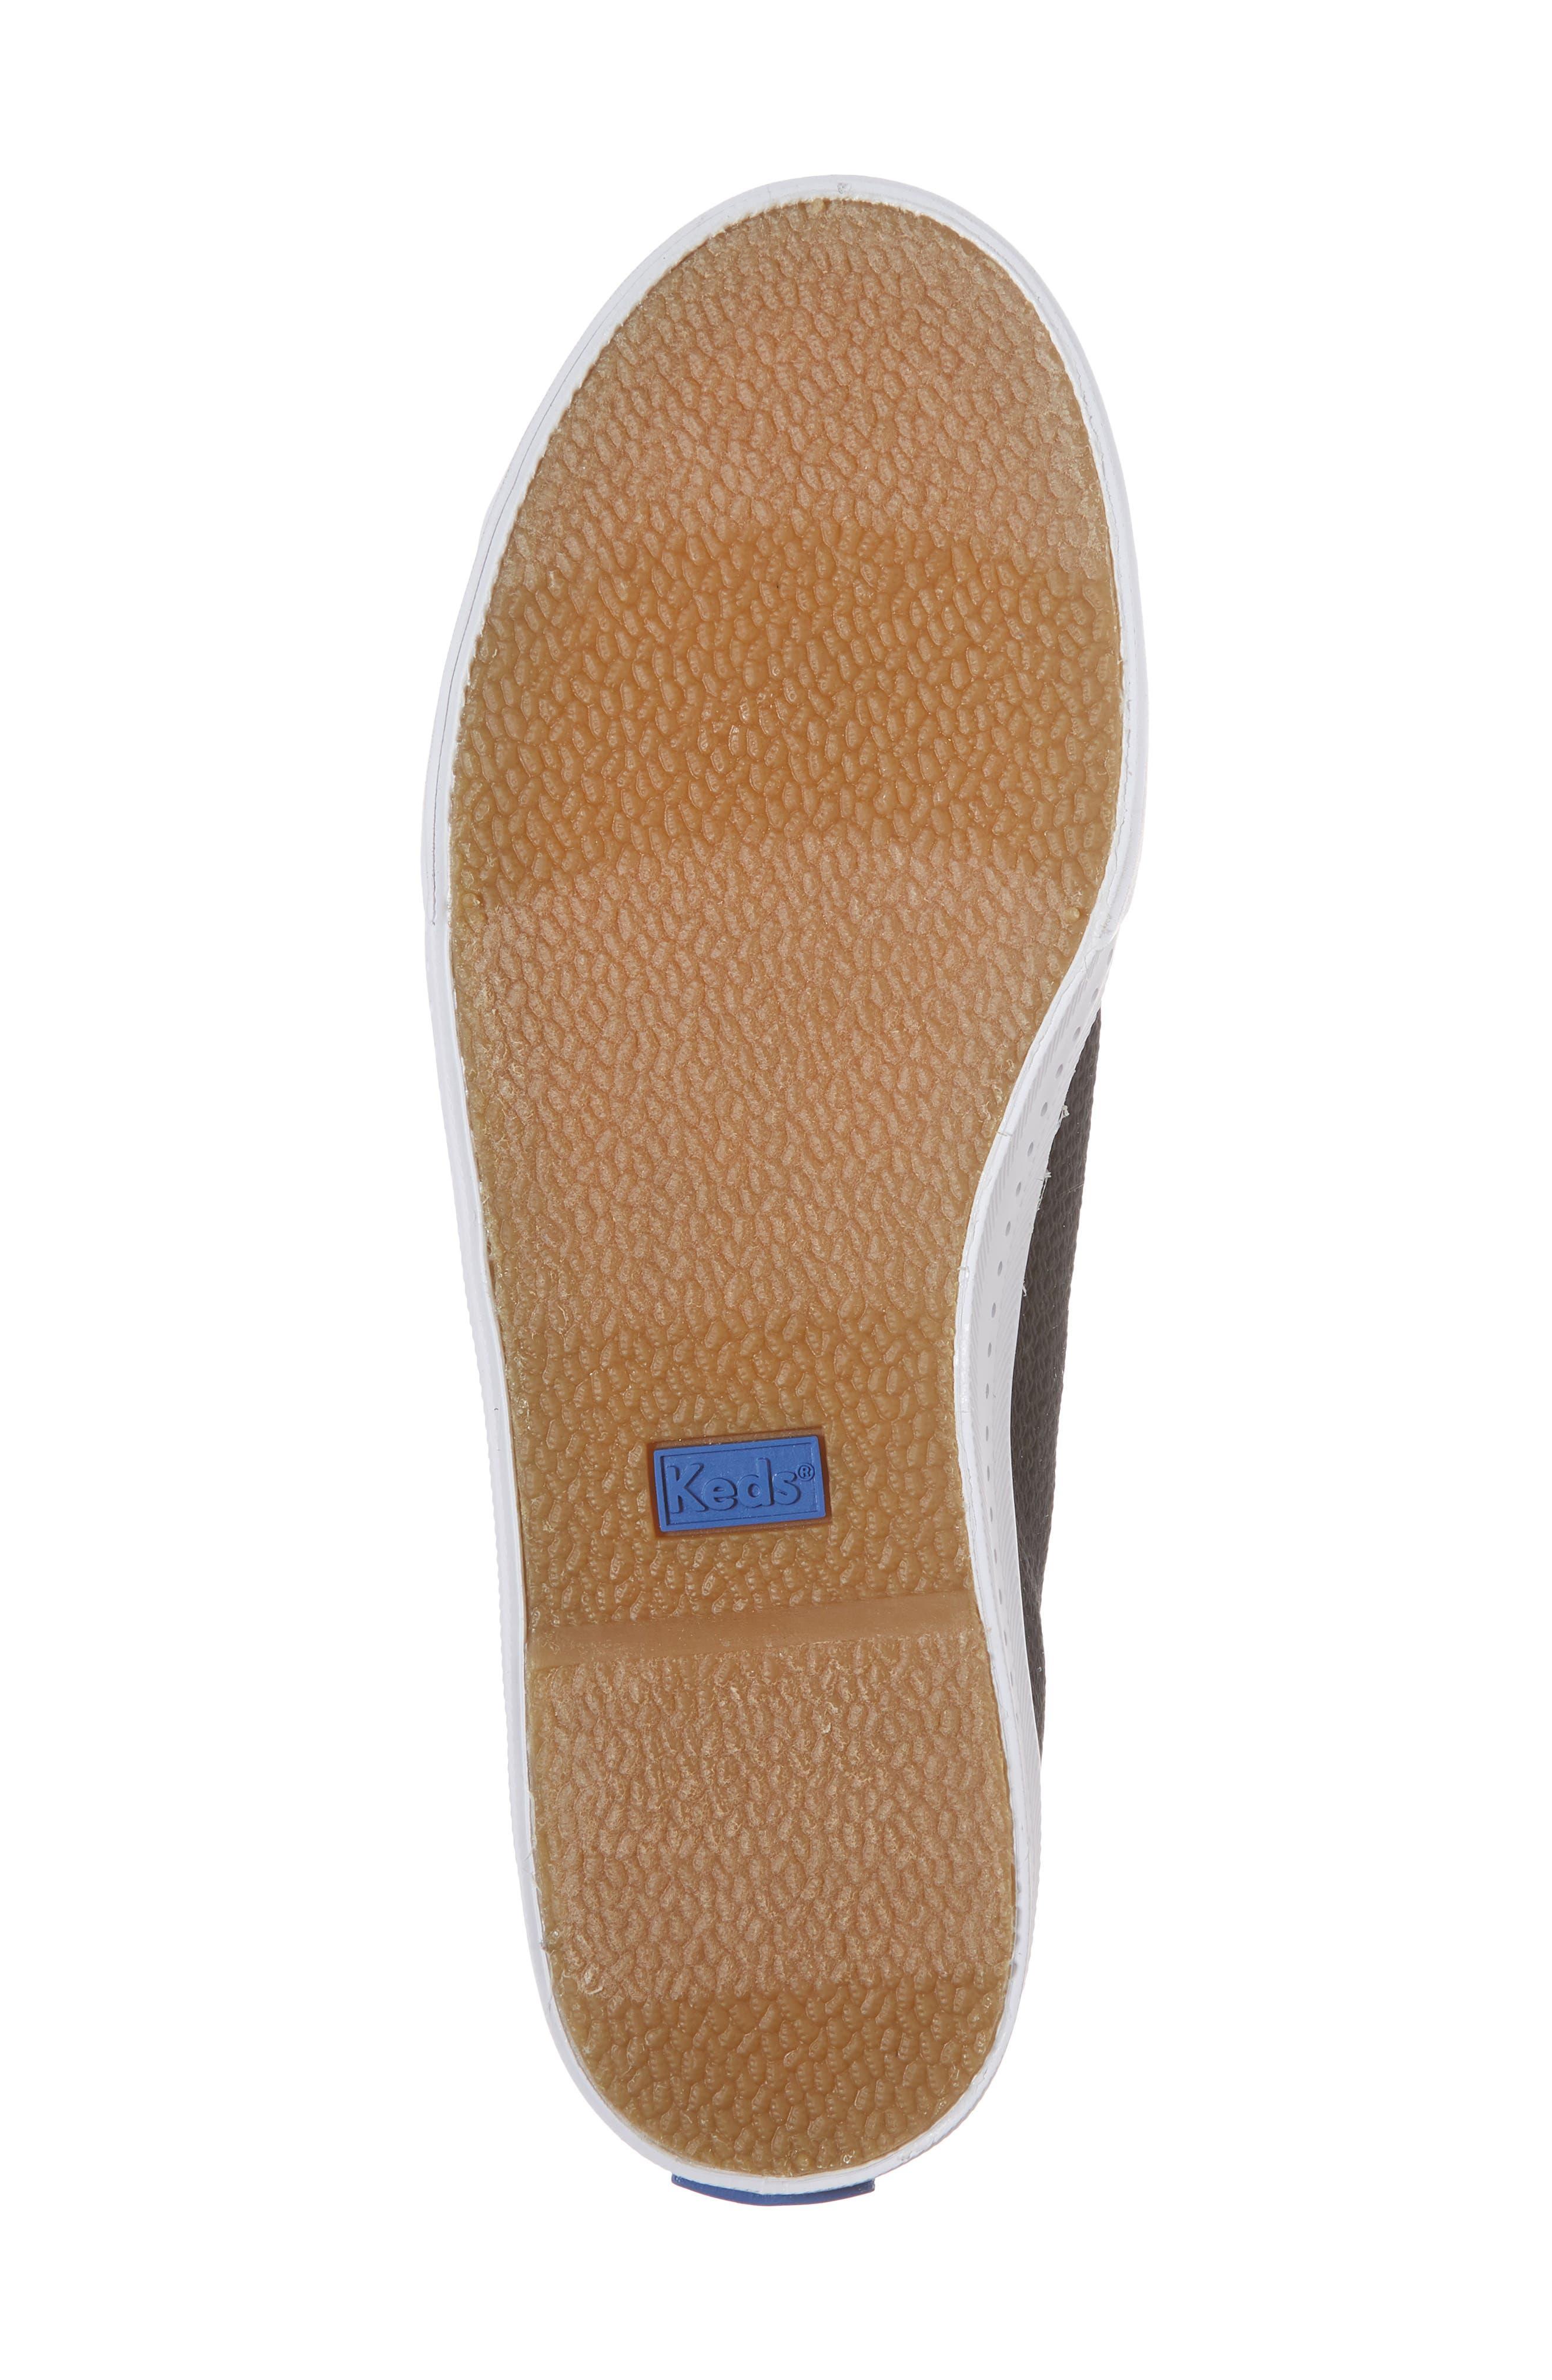 Driftkick Heathered Mesh Sneaker,                             Alternate thumbnail 6, color,                             Black